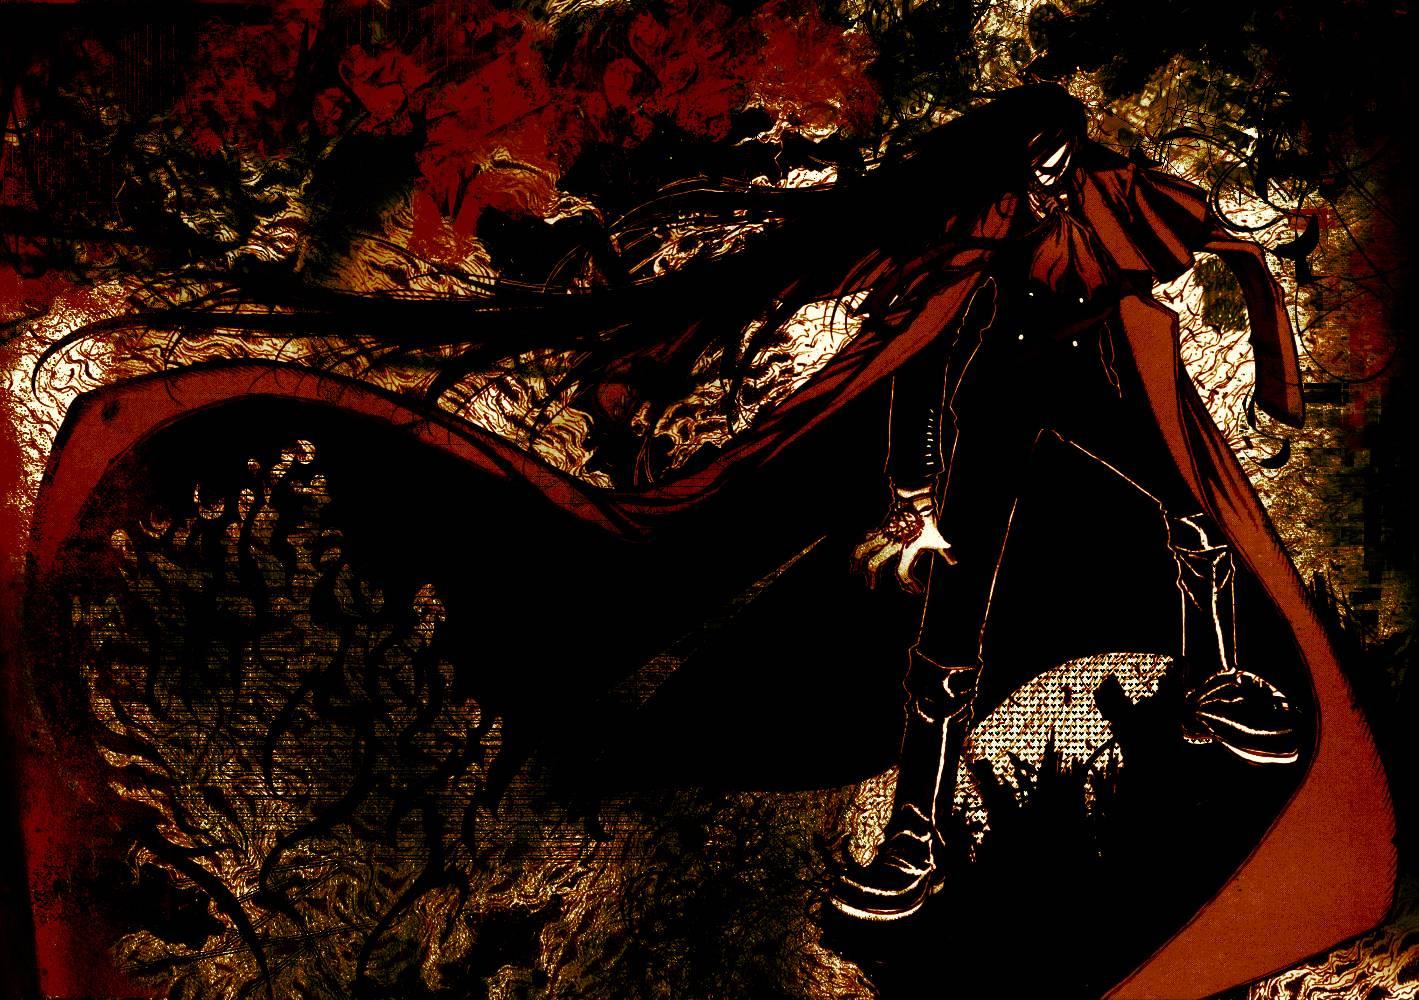 Hellsing Alucard Wallpapers - Wallpaper Cave